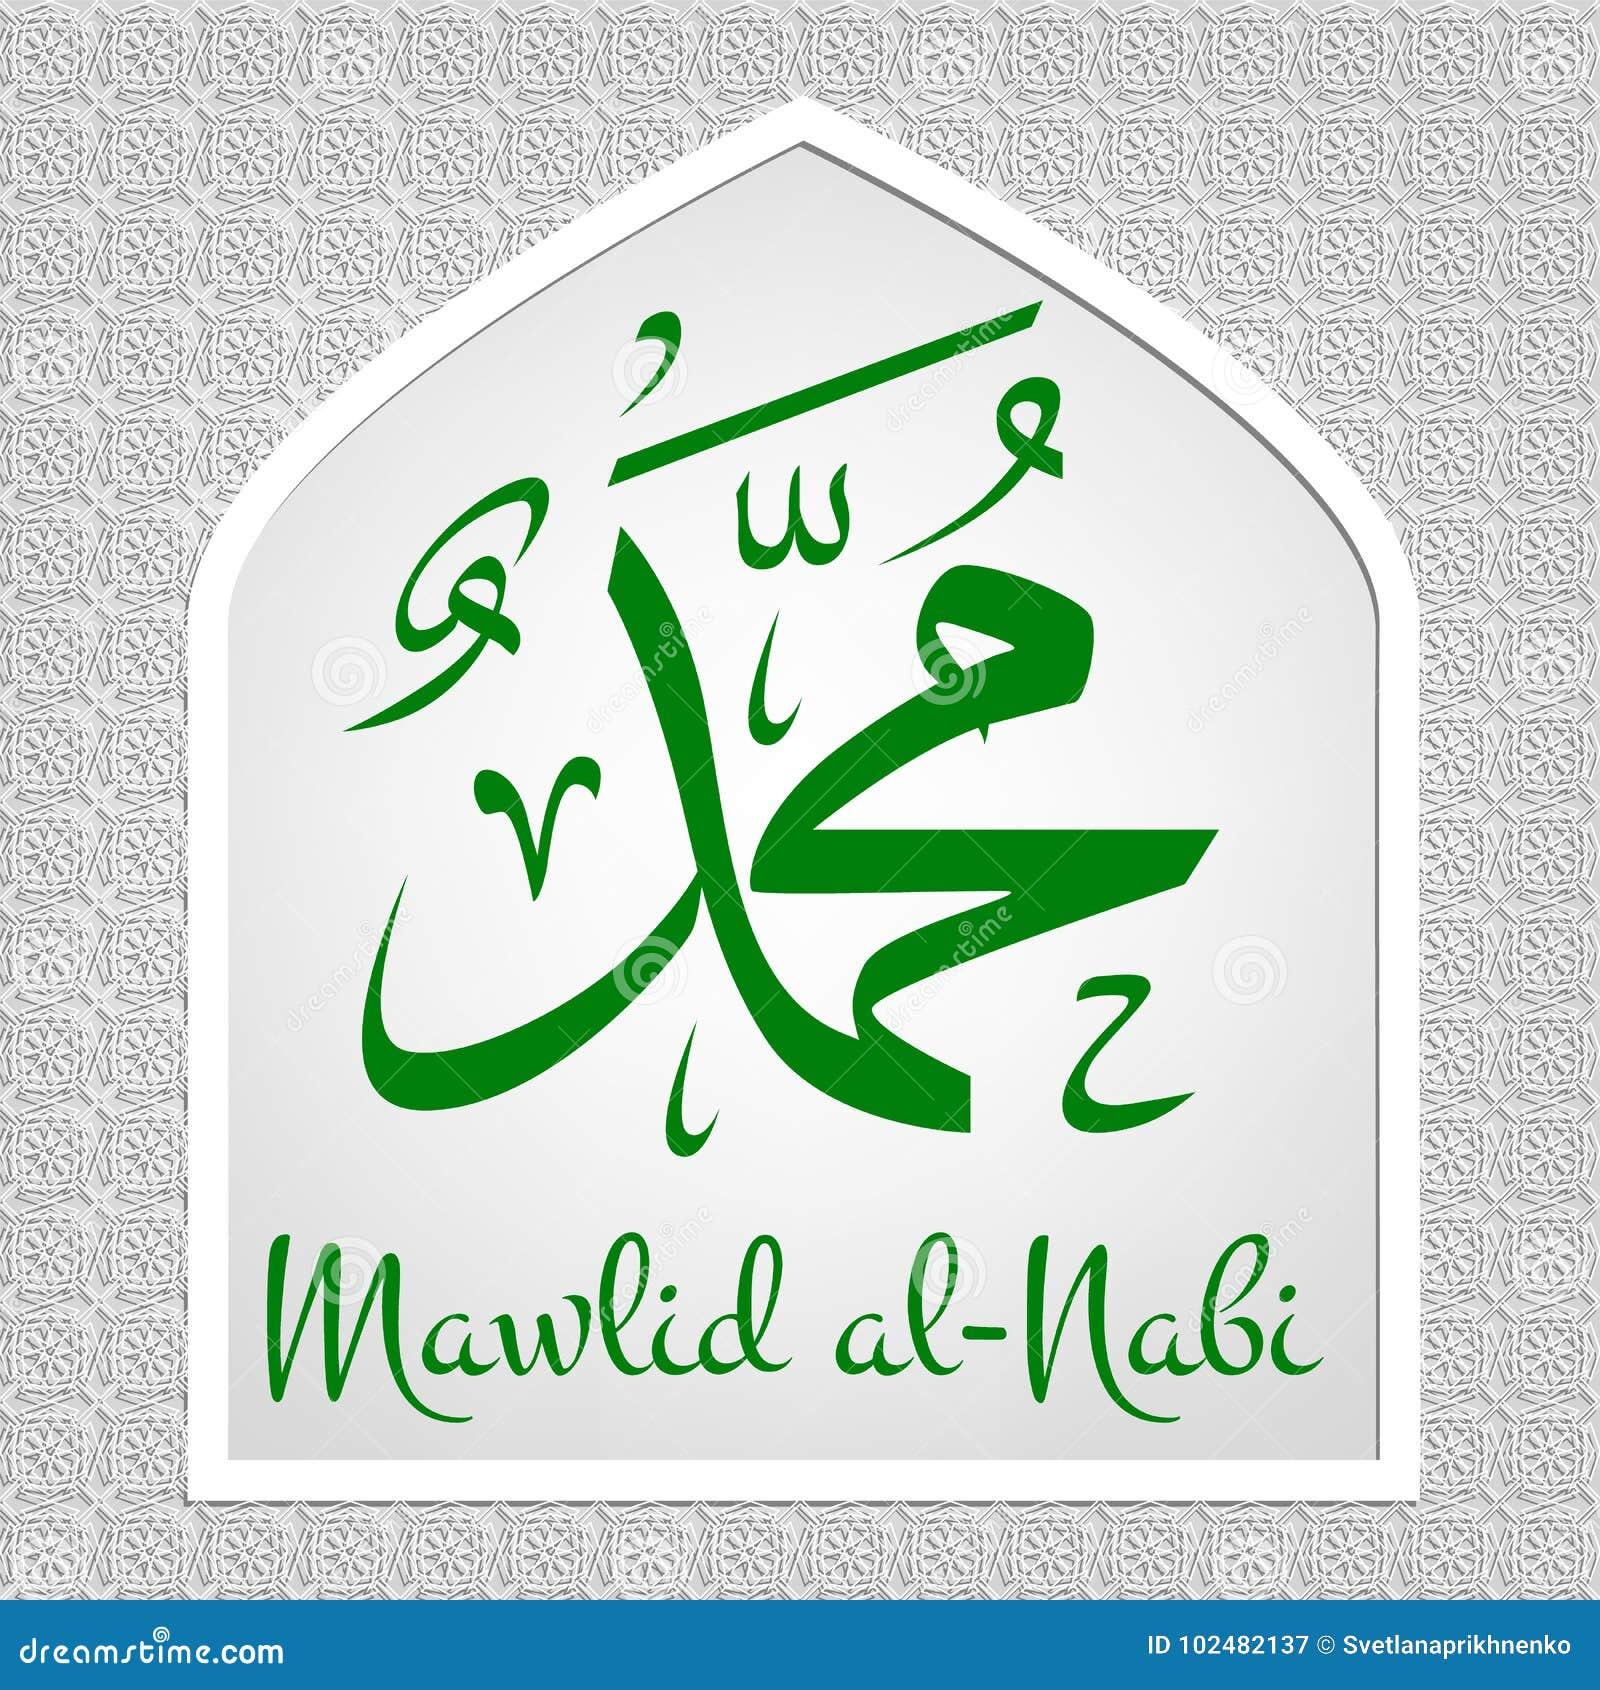 Mawlid al nabi stock vector illustration of design 102482137 translation prophet muhammads birthday greeting card for islamic holiday m4hsunfo